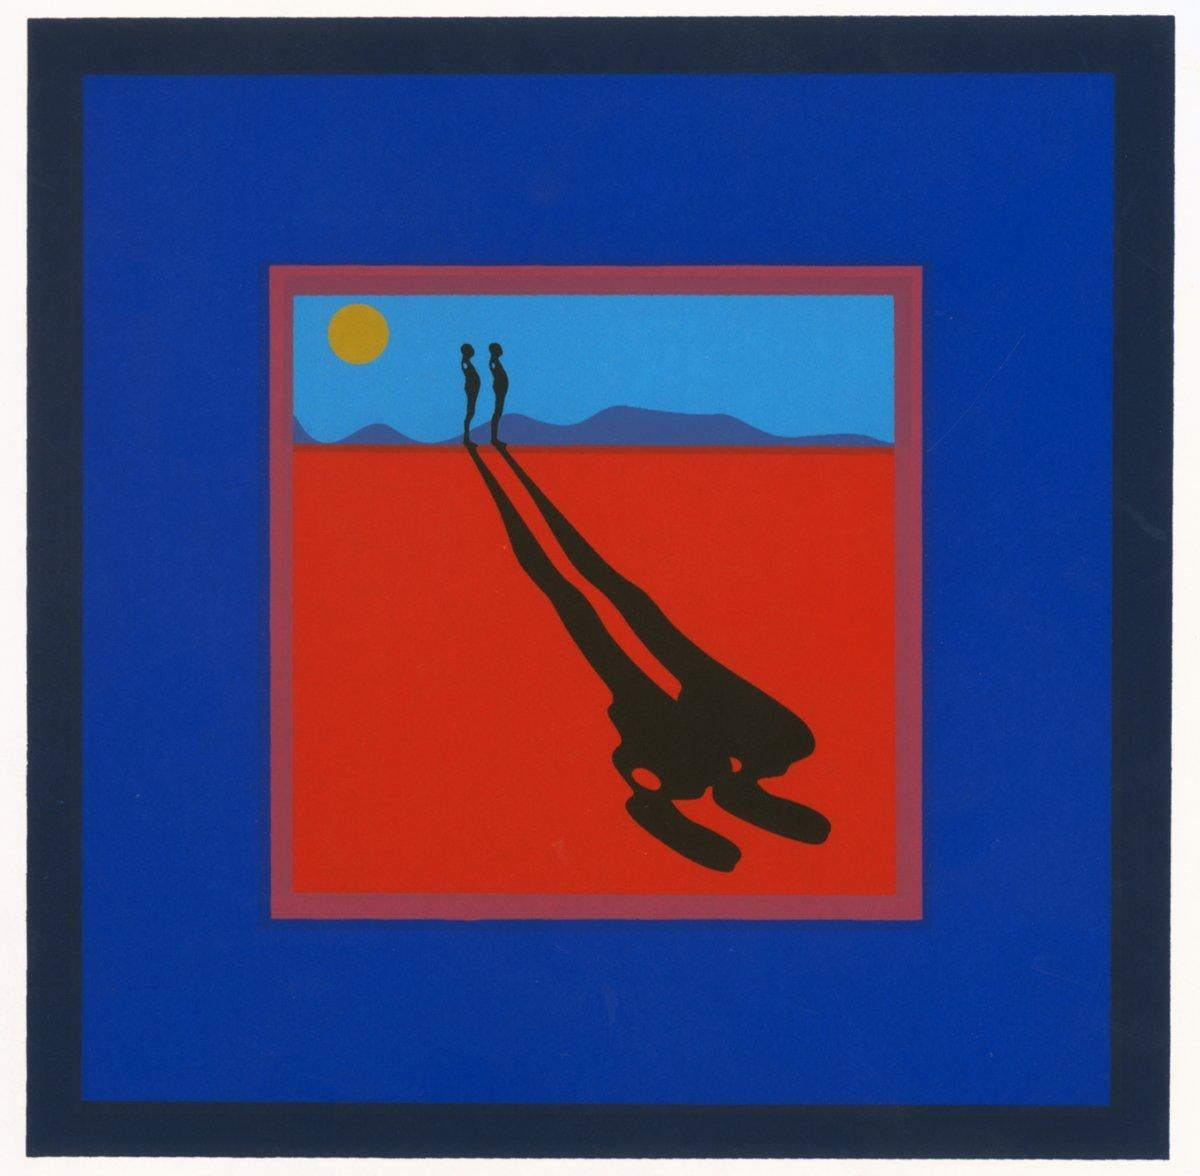 1972 Ernest Trova 'Falling Man' Pop Art Blue,Red USA Serigraph